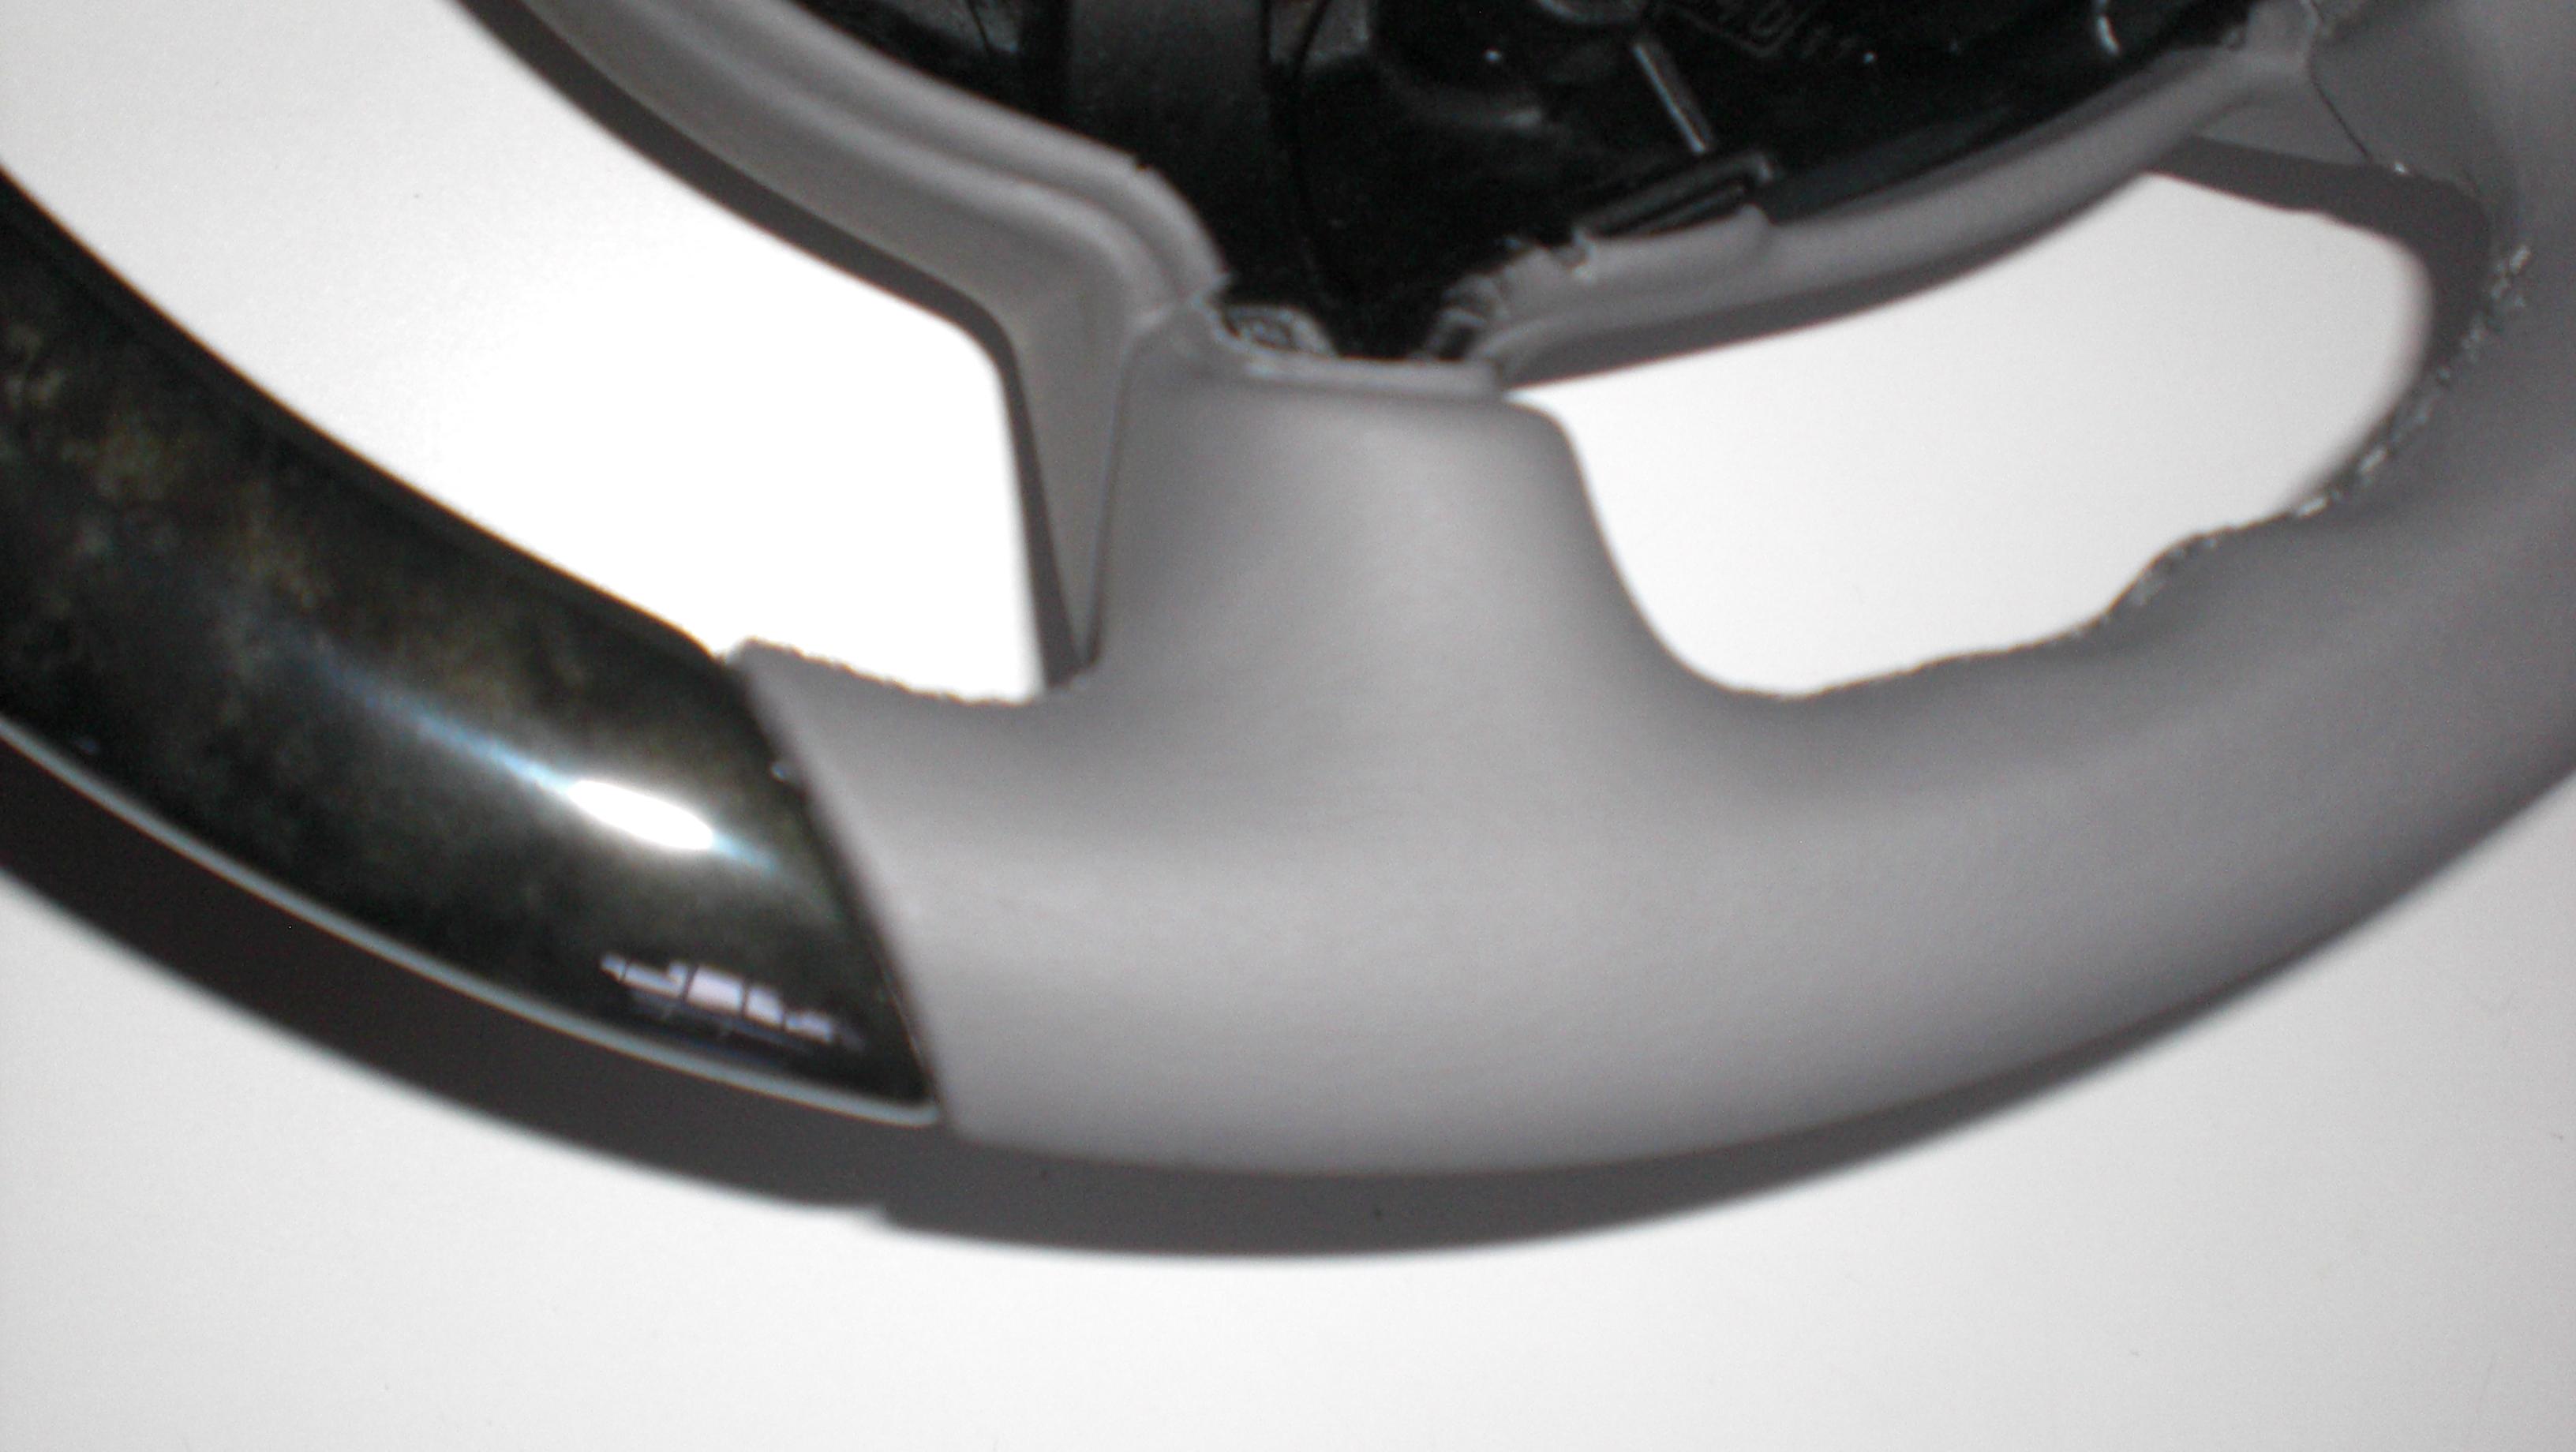 Sport Lenkrad Mercedes E Klasse W211 mit Prüfbericht